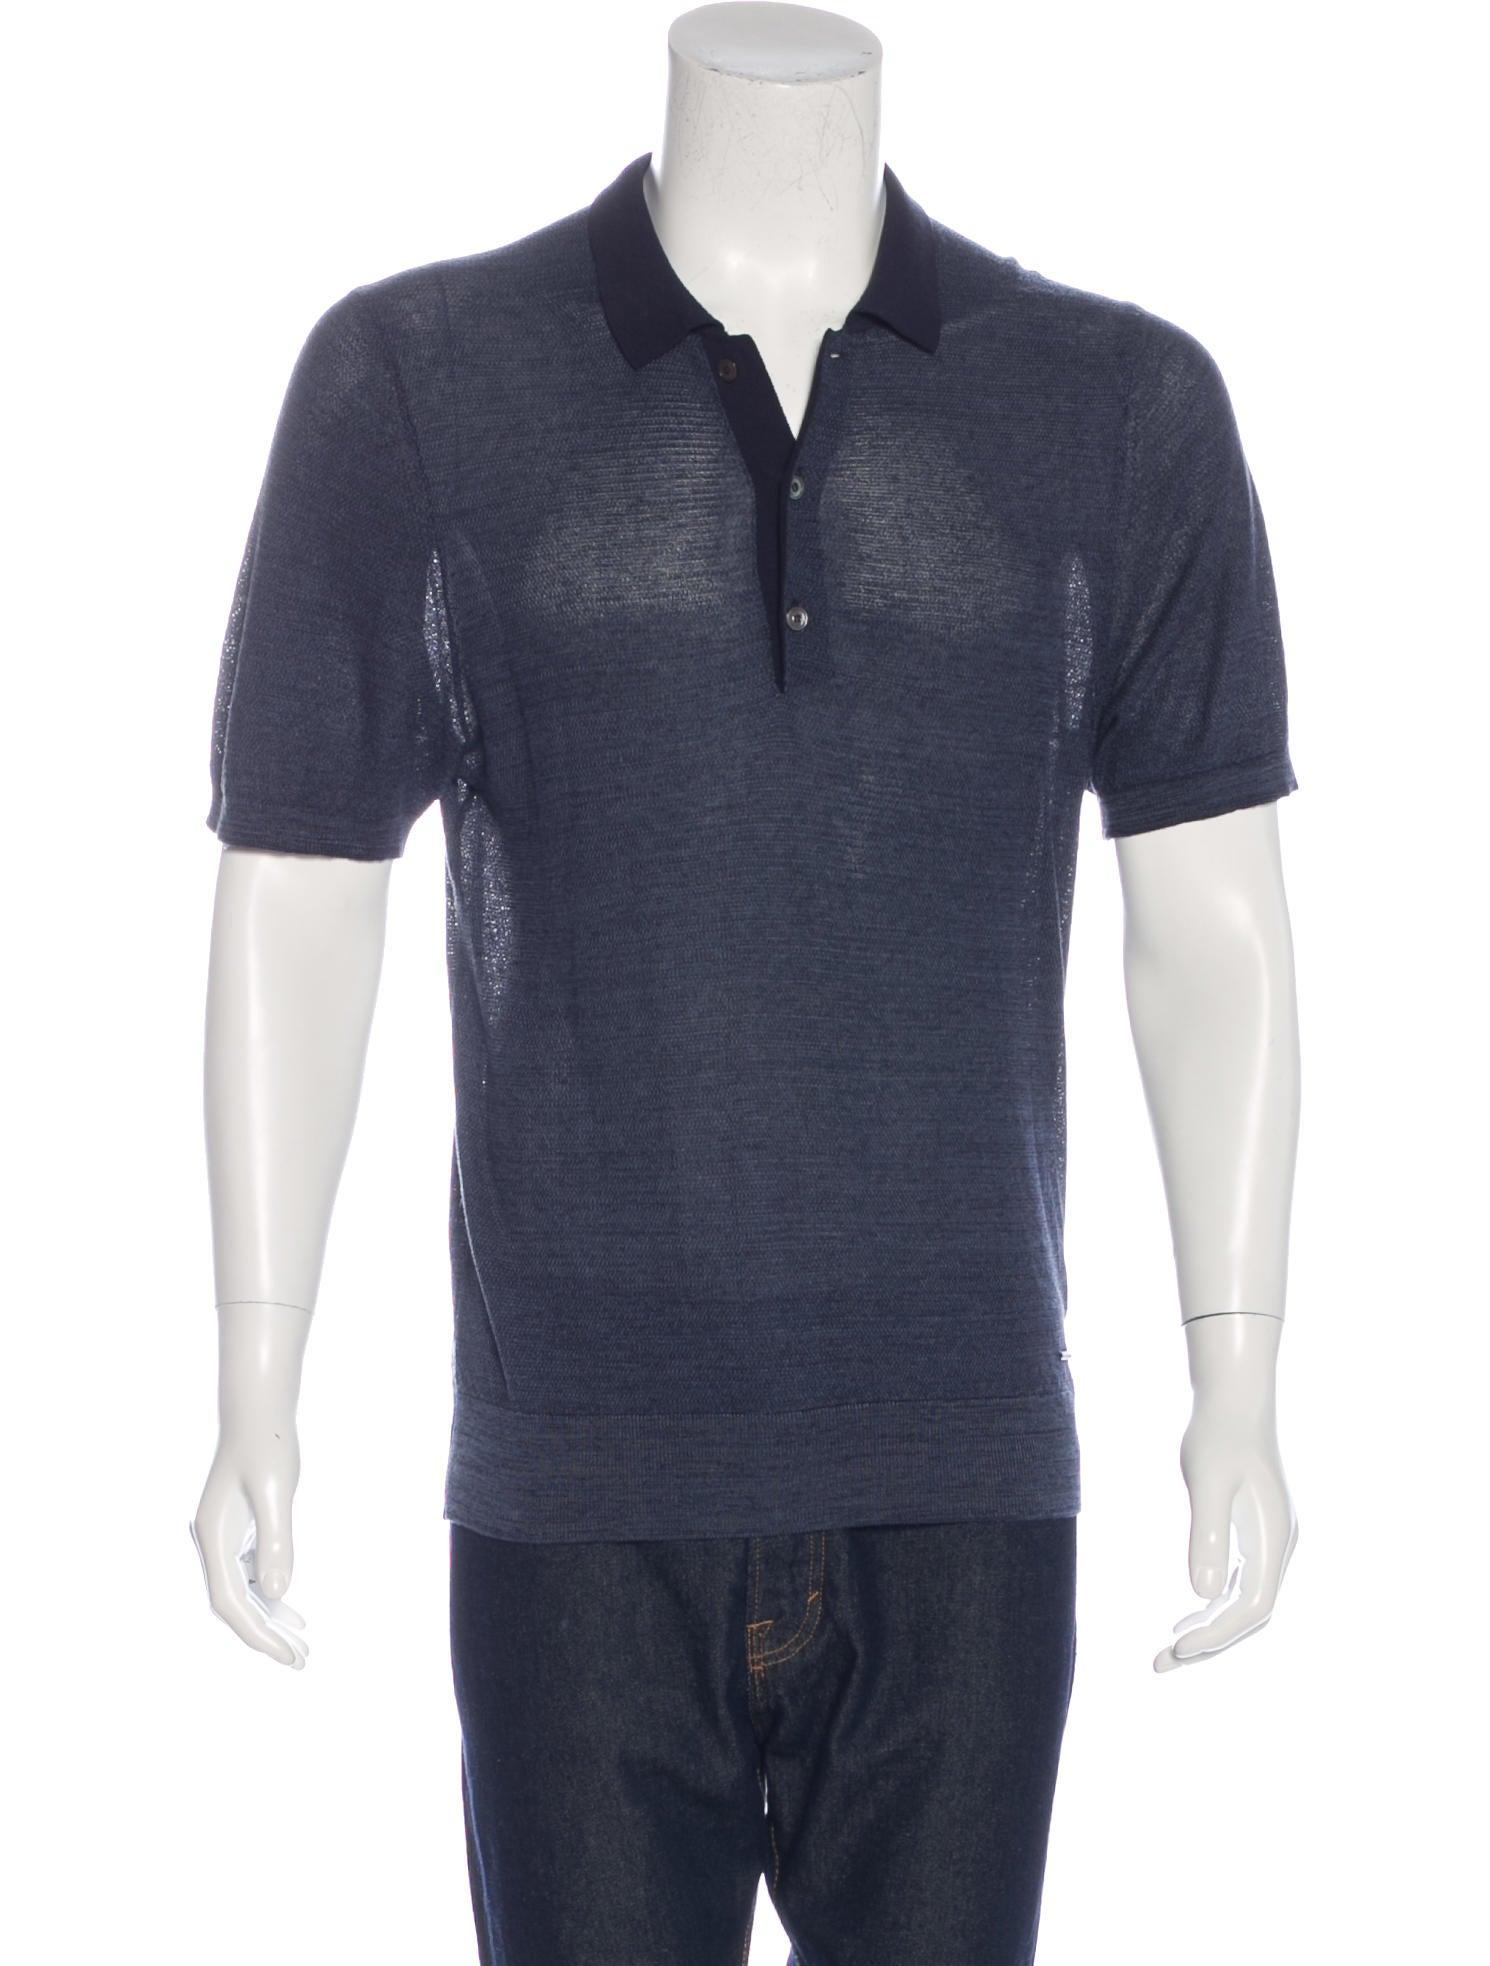 Burberry Silk Blend Polo Shirt Clothing Bur74087 The